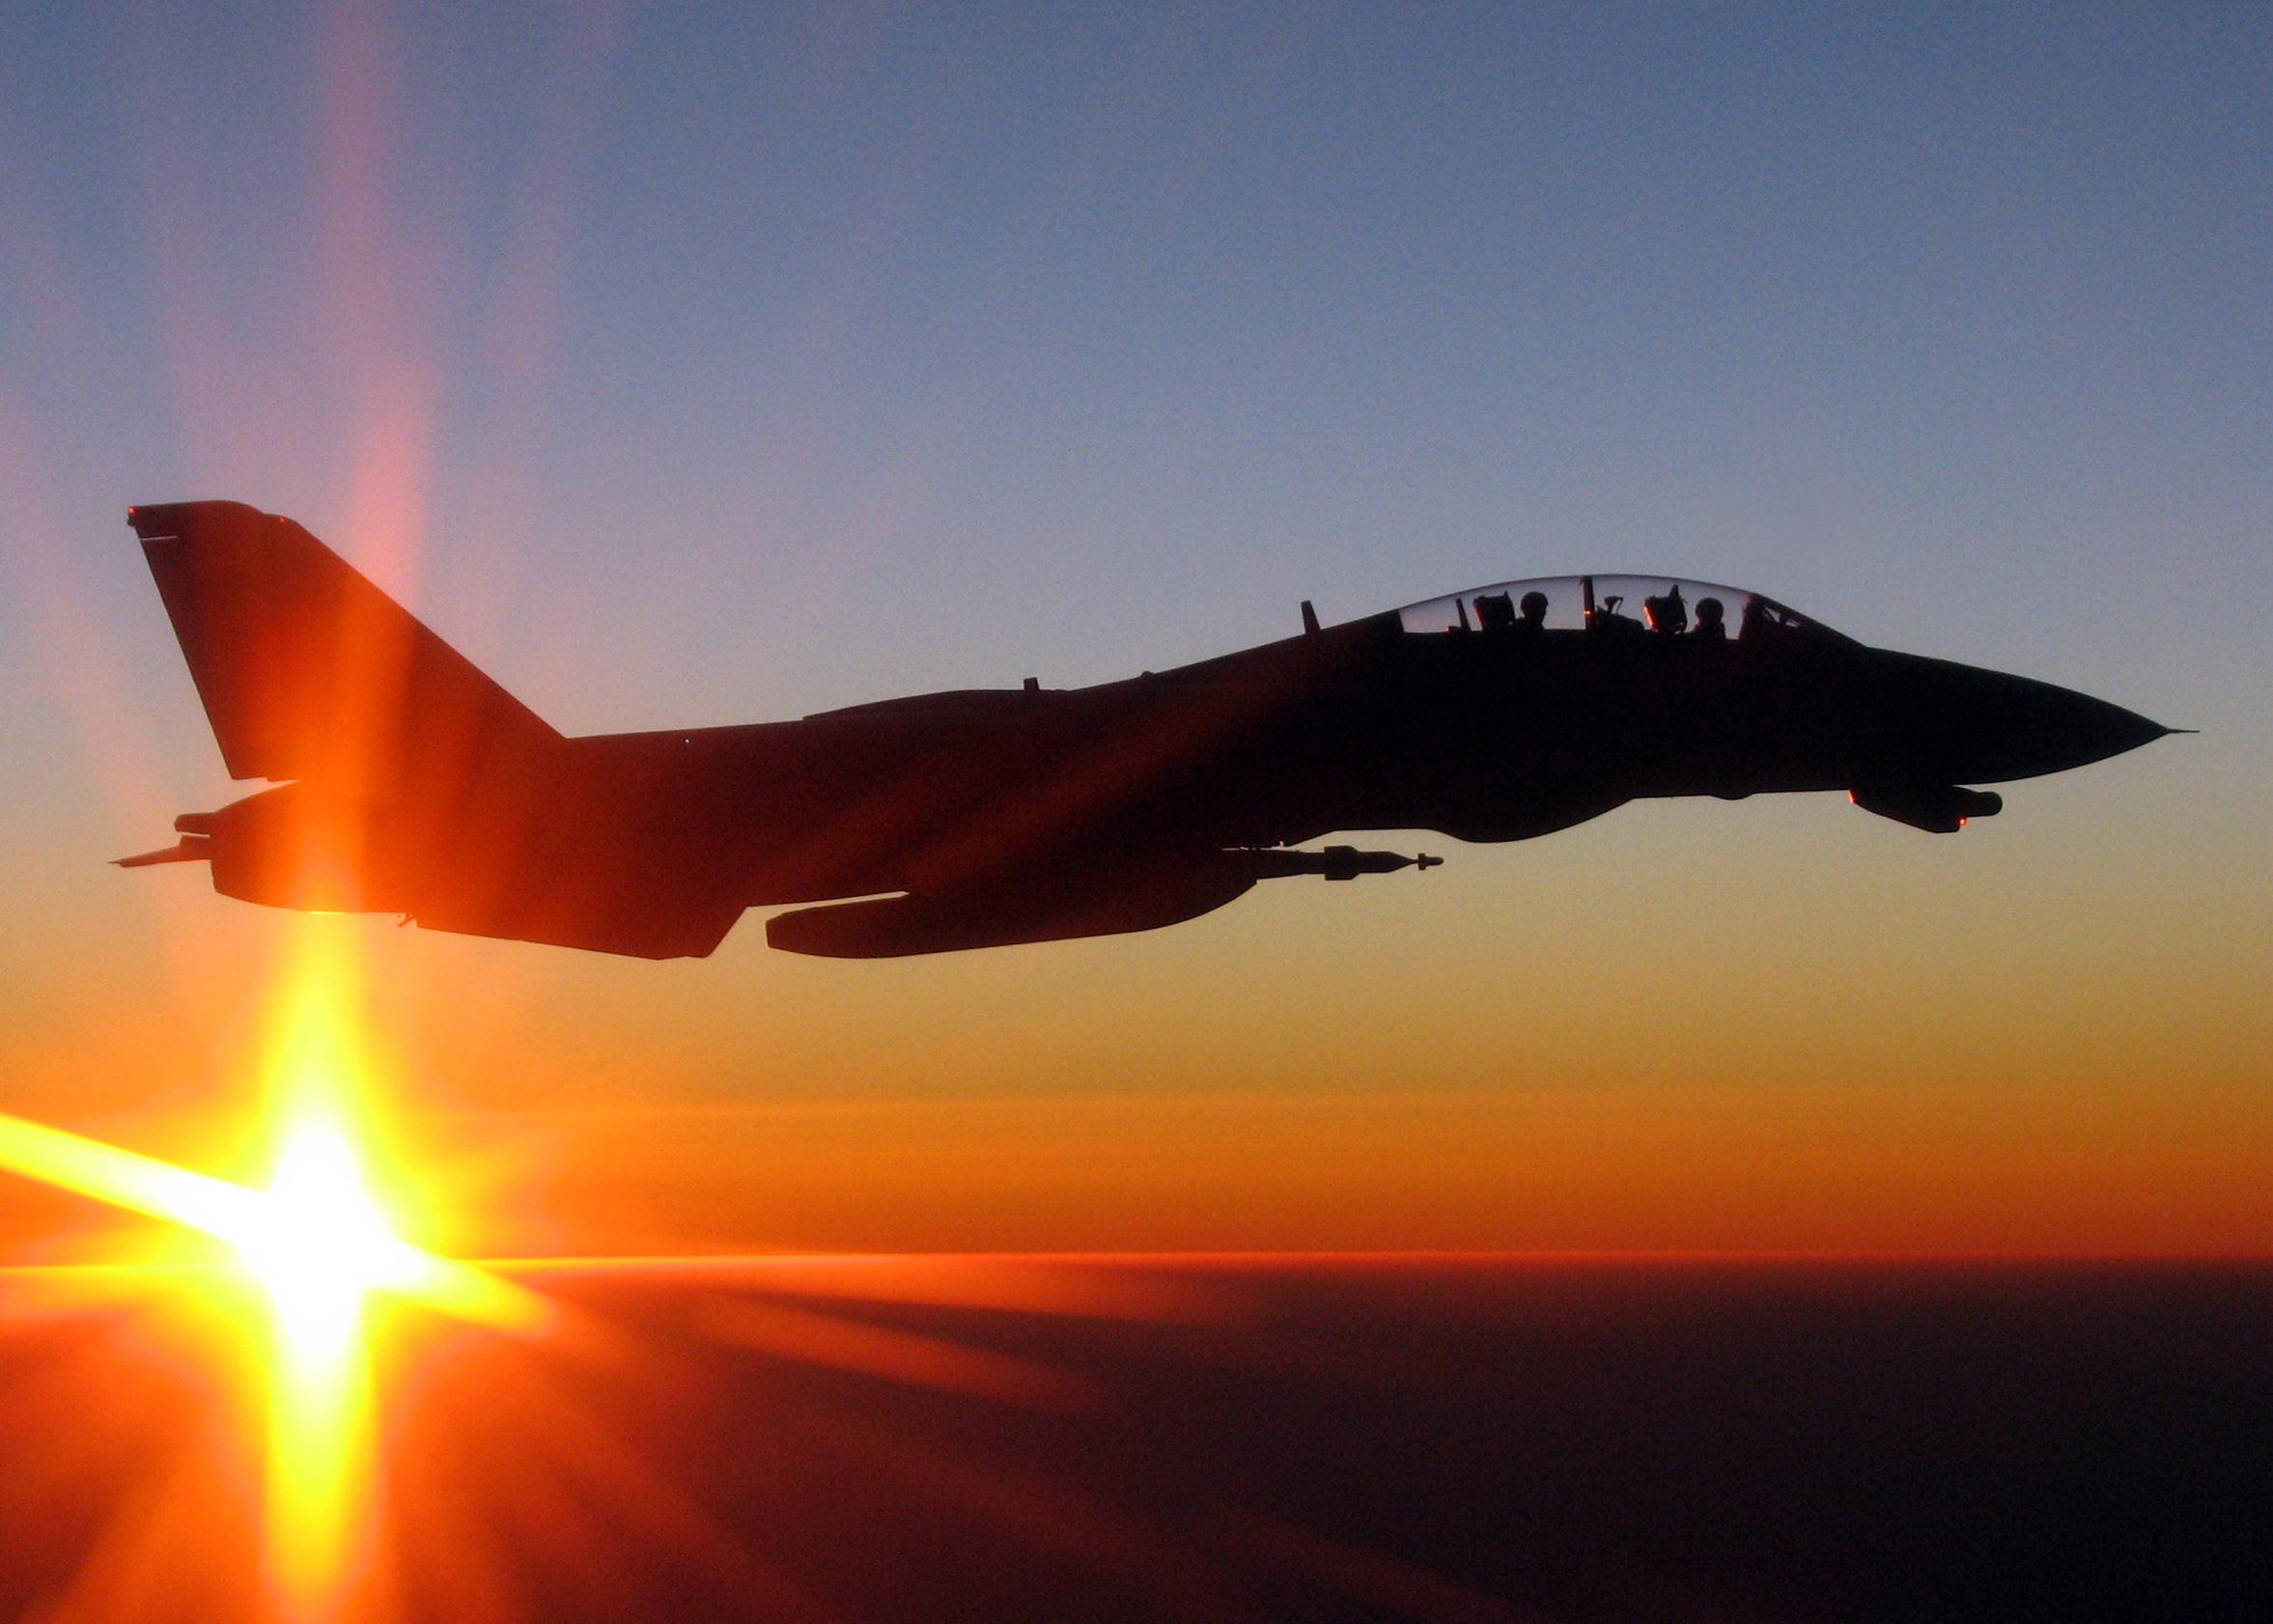 14 afterburner sunset - photo #15